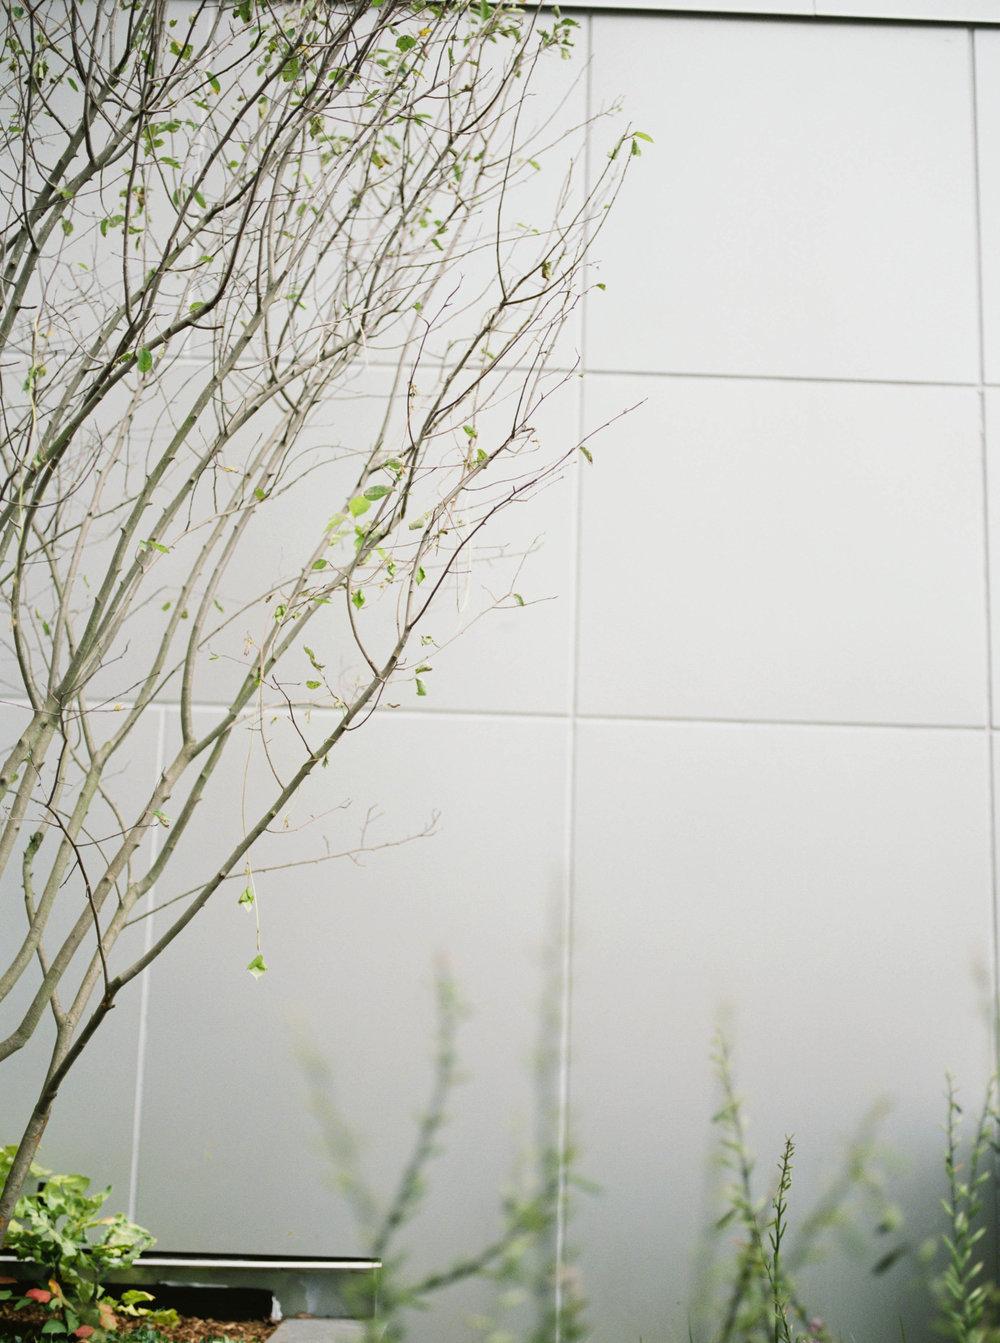 haley-richter-photography-500-walnut-wedding-philadelphia-architecture-131.jpg